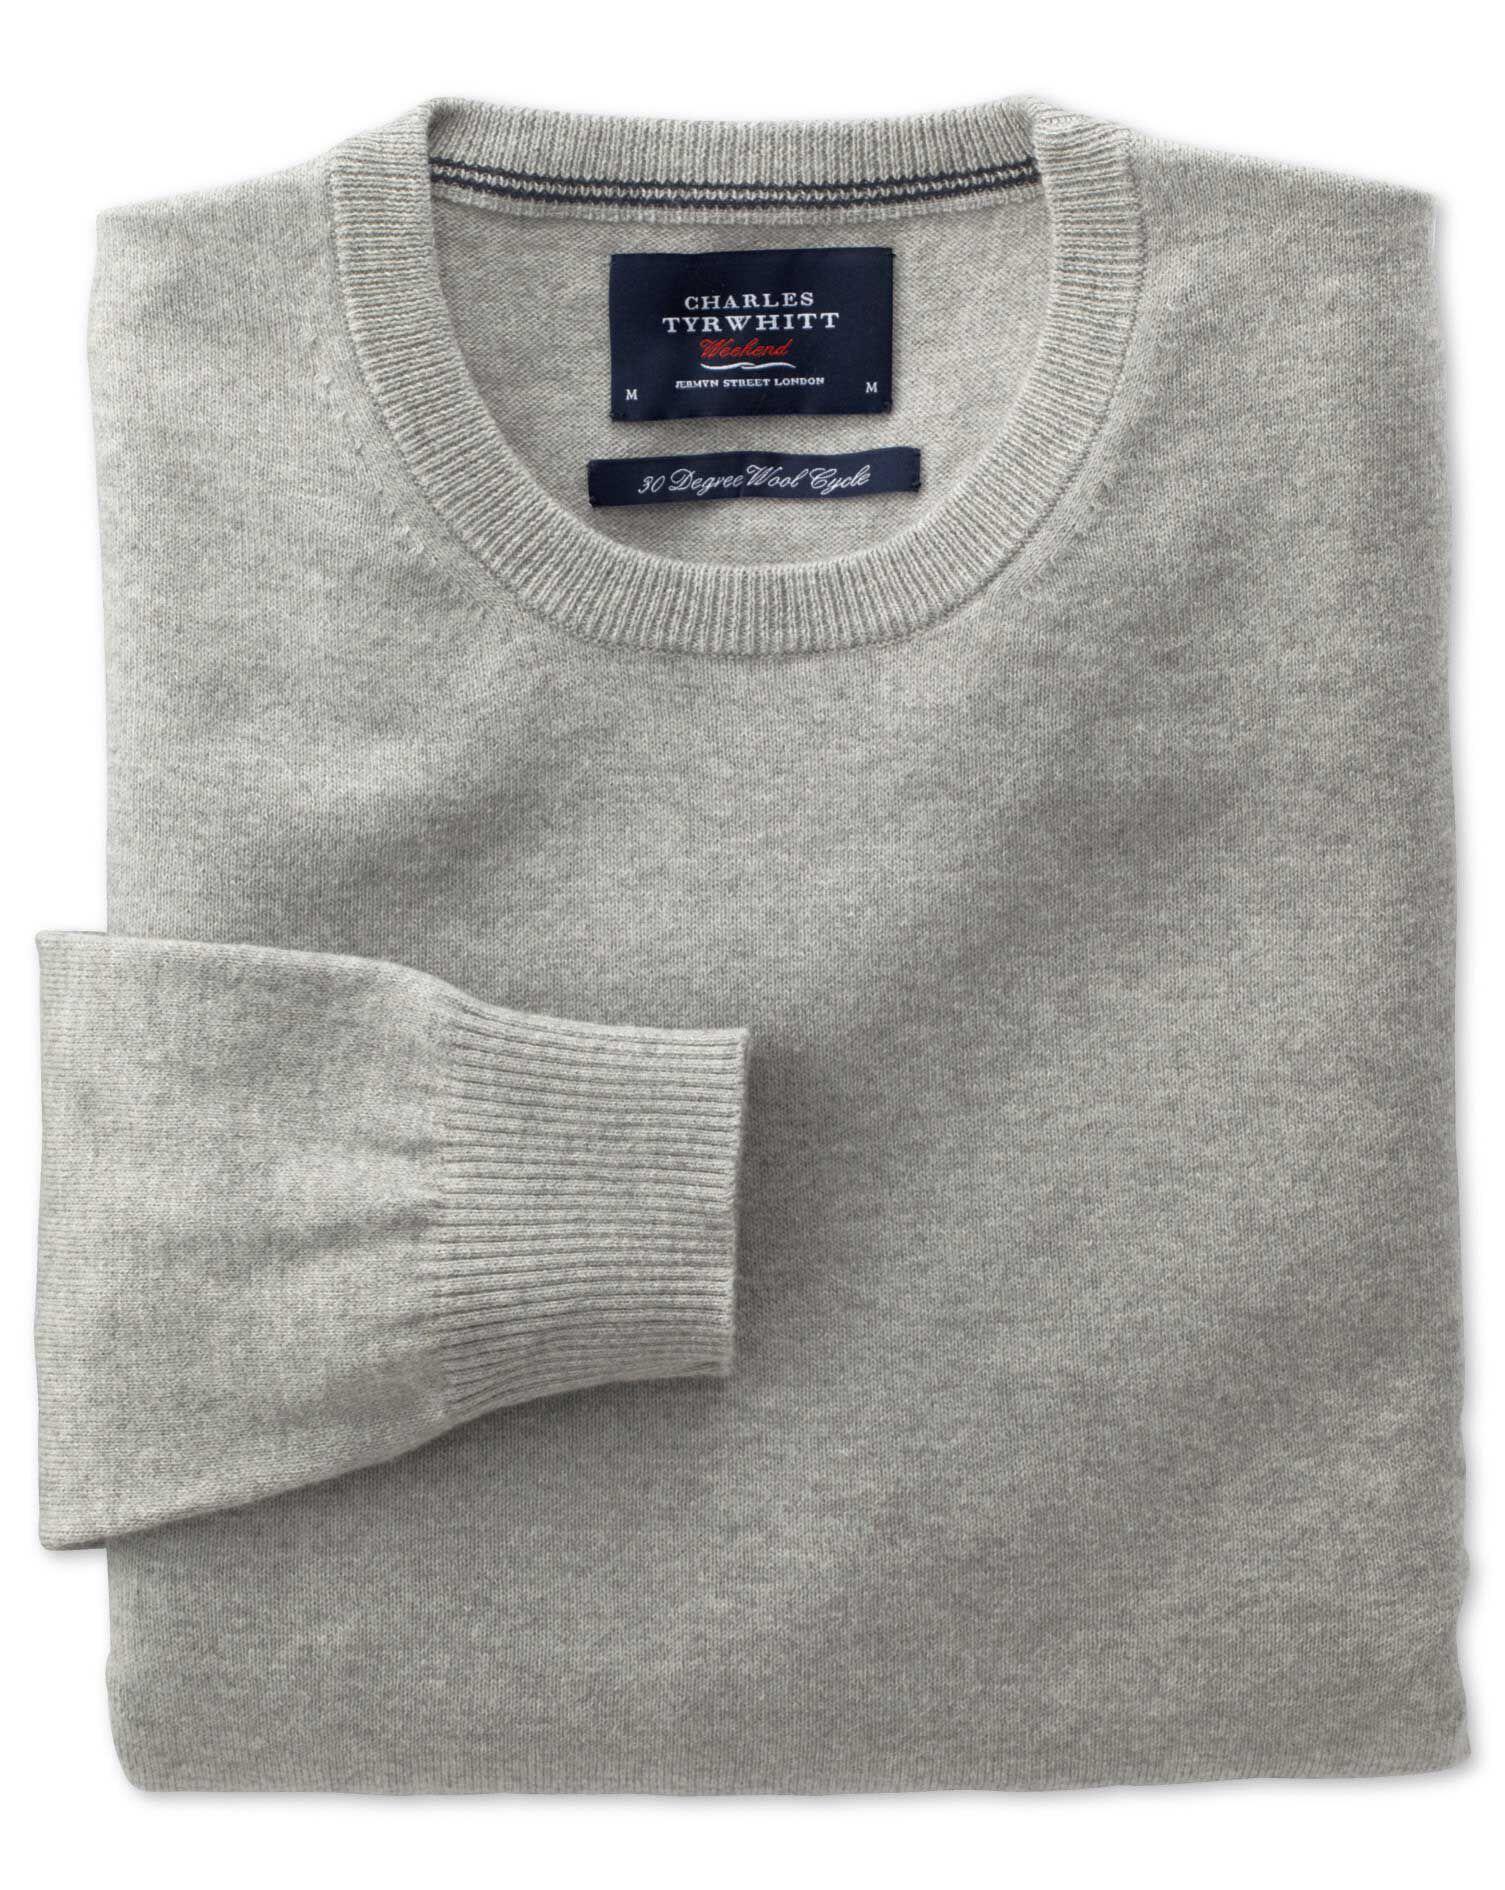 Light Grey Cotton Cashmere Crew Neck Jumper Size XL by Charles Tyrwhitt